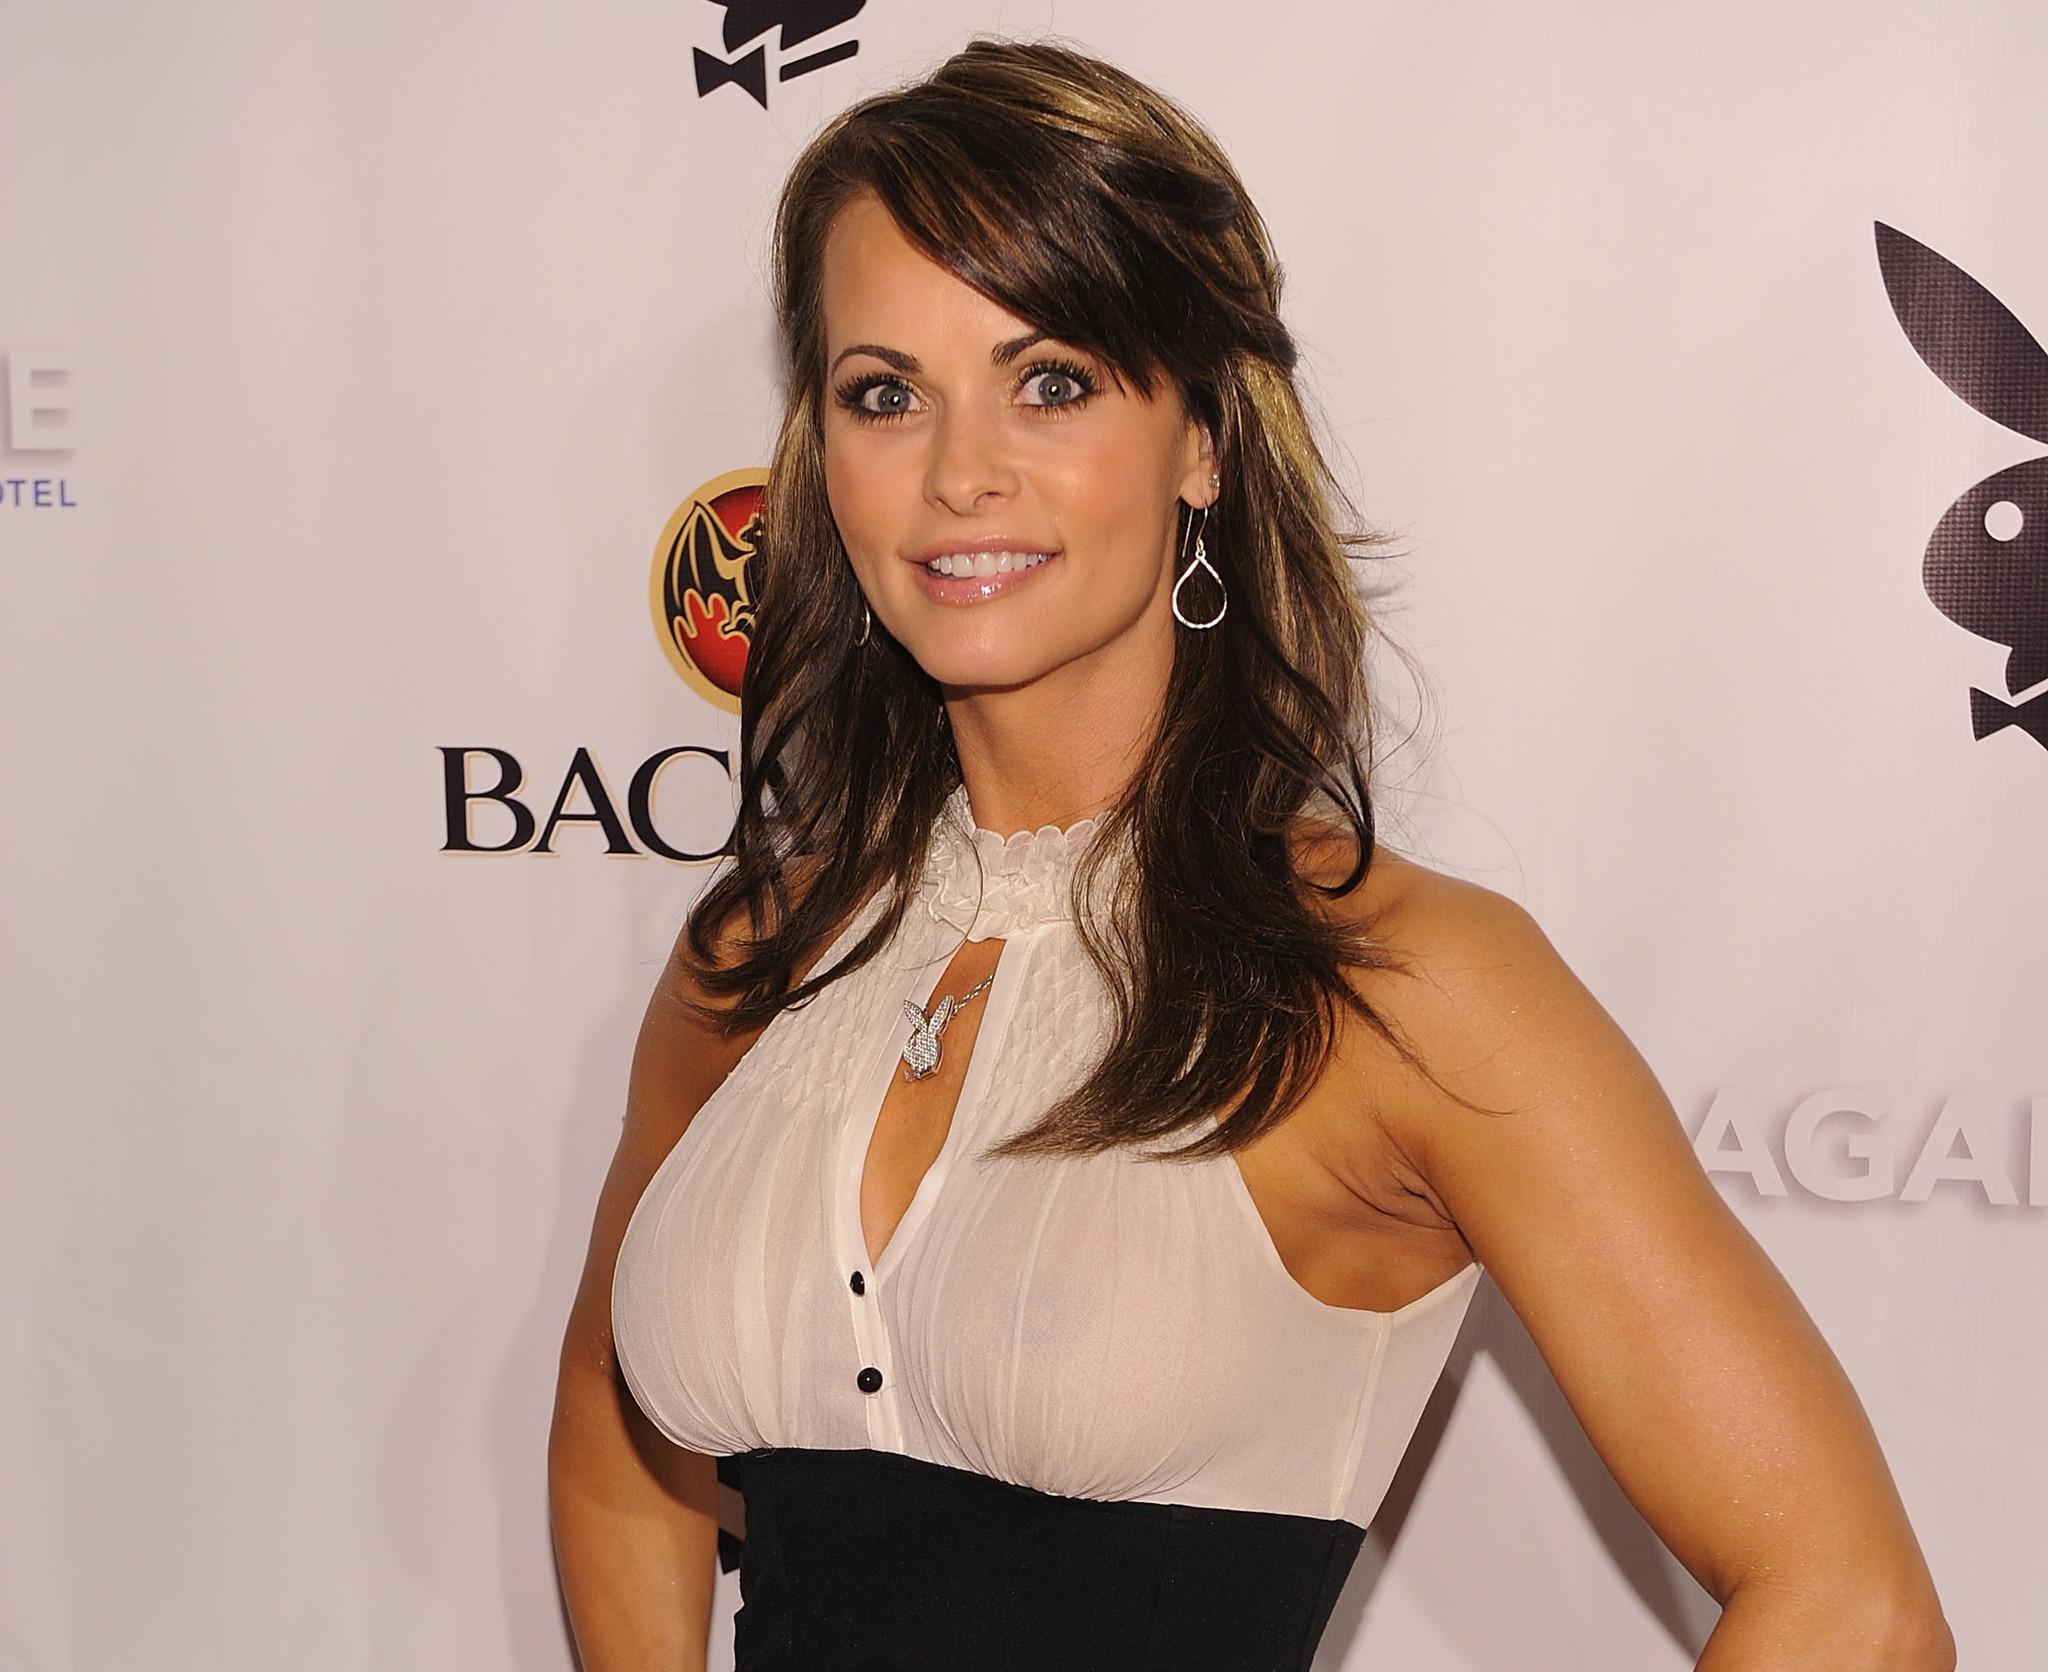 Playboy model Karen McDougal sues Fox News over Tucker Carlson remarks alleging she tried to shake down President Trump